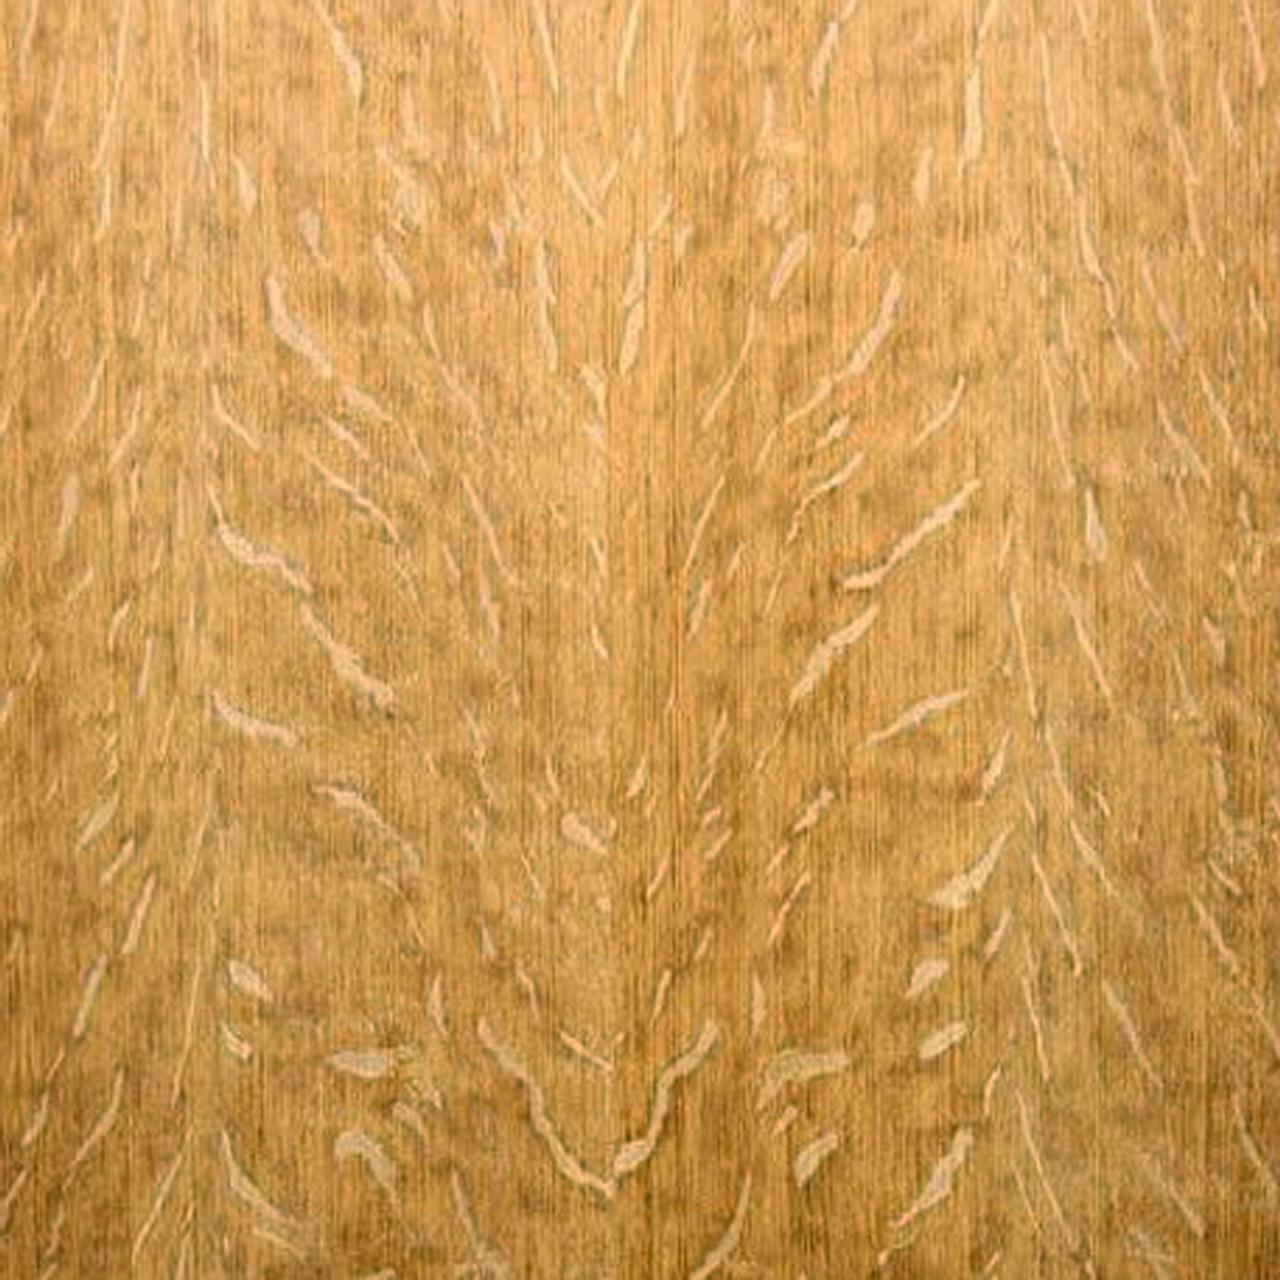 CONSECUTIVE SHEETS OF BROWN OAK VENEER 18X30CM BO#1 MARQUETRY